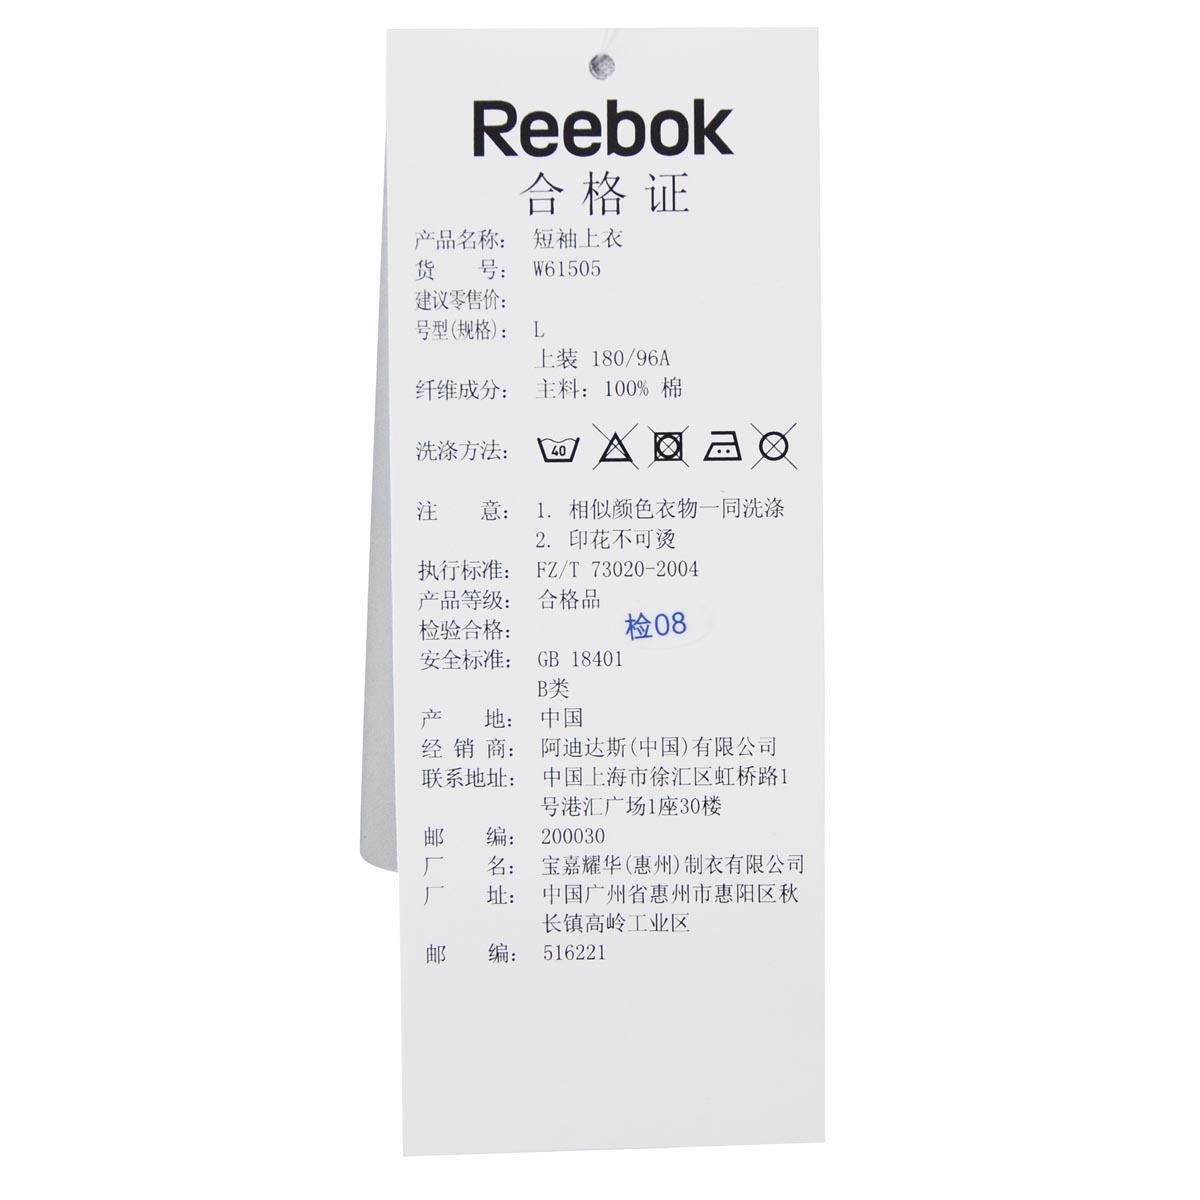 Рубашка поло Reebok rb7013 2012 POLO W61505 Для мужчин 100 Короткие рукава ( ≧35cm ) Логотип бренда Для спорта и отдыха